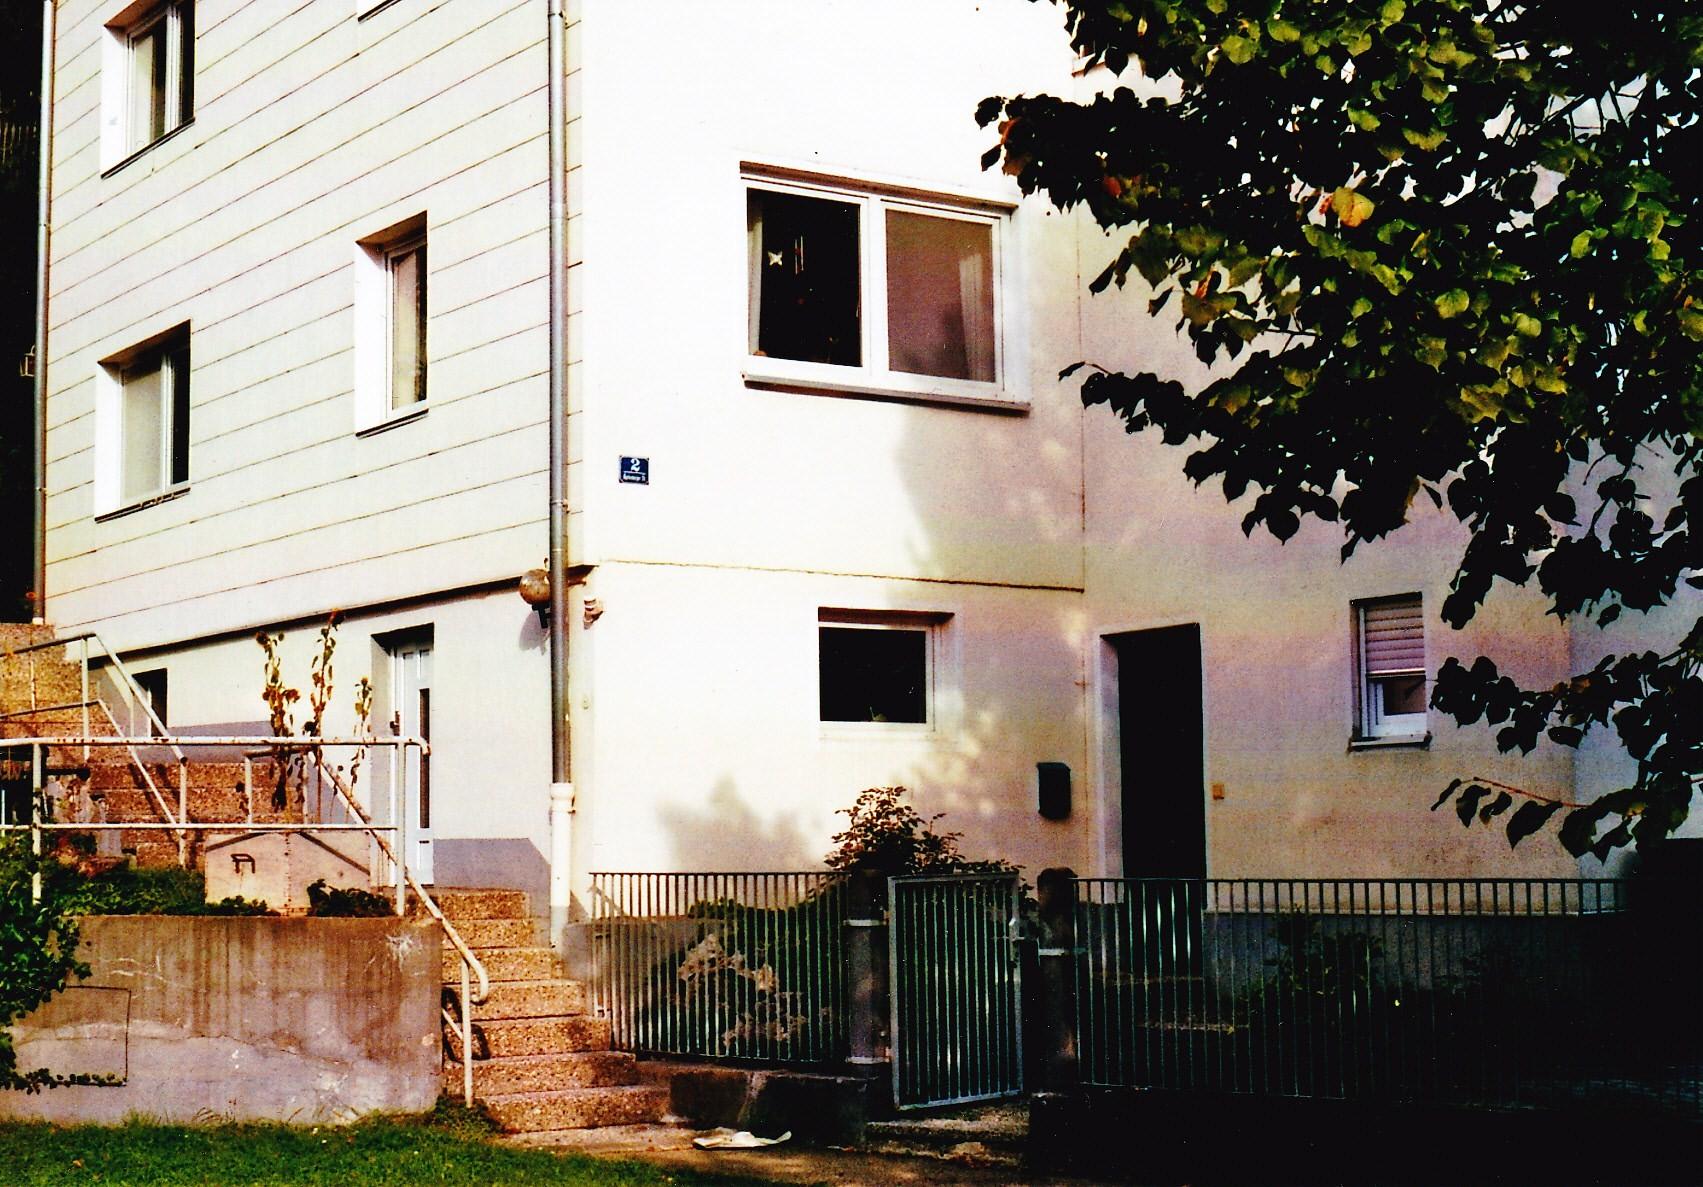 Studio Eichstätt 1999 - 2005